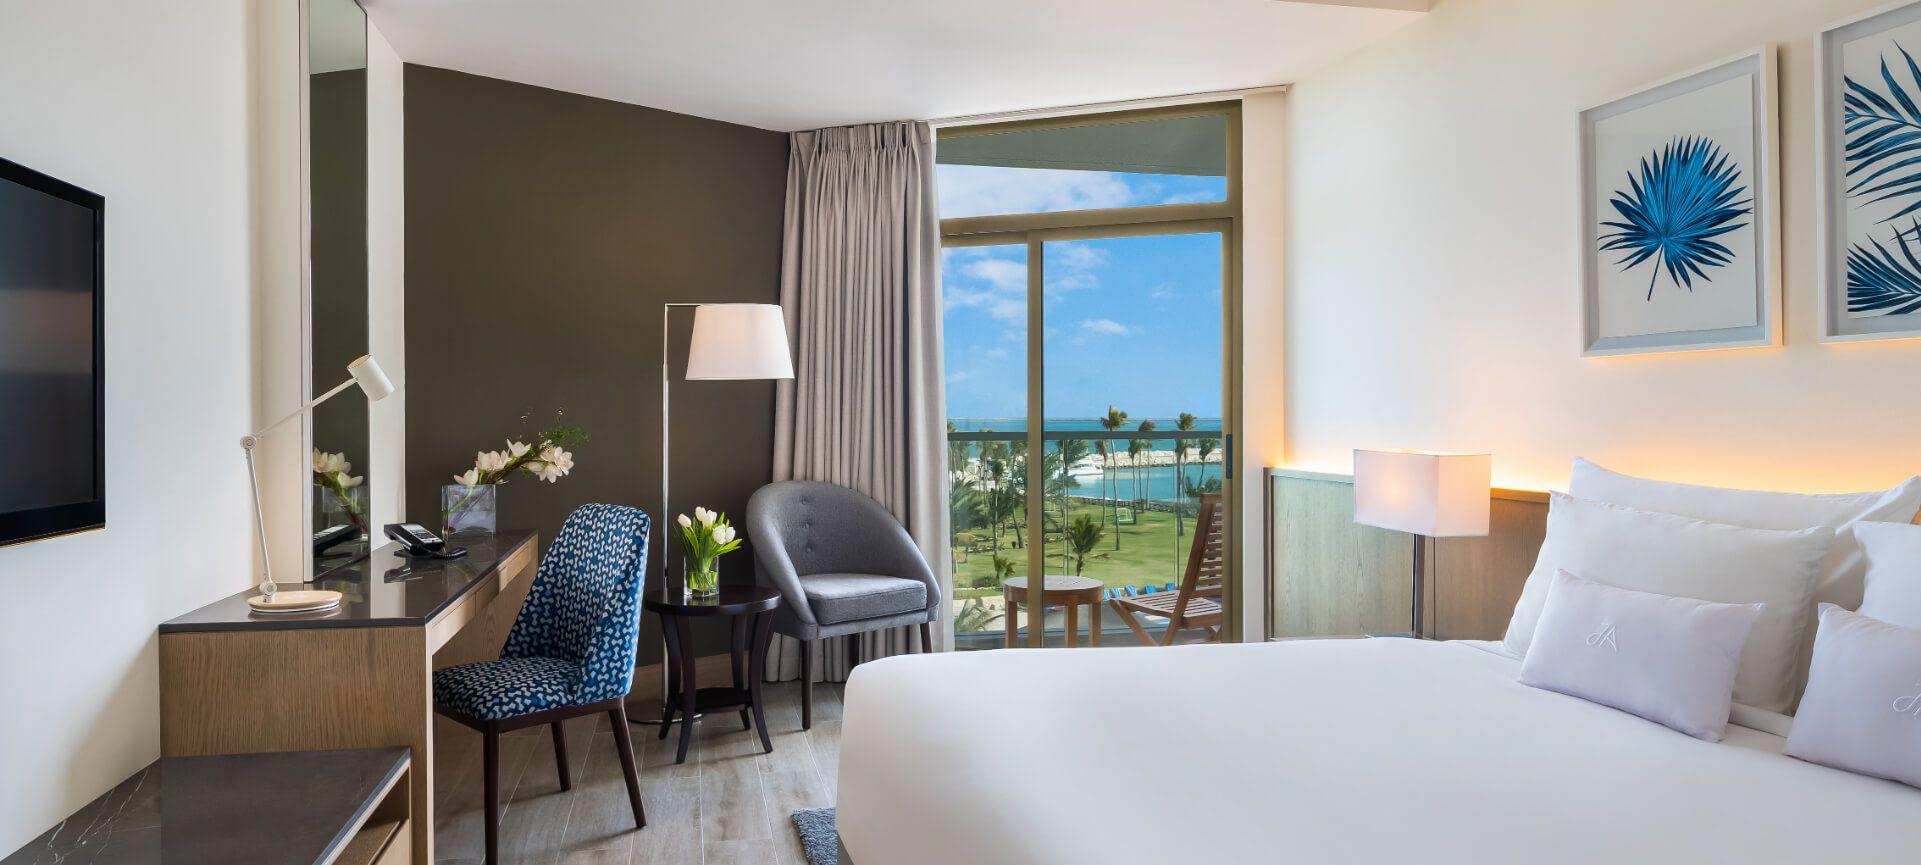 Renovation News from JA Resorts & Hotels